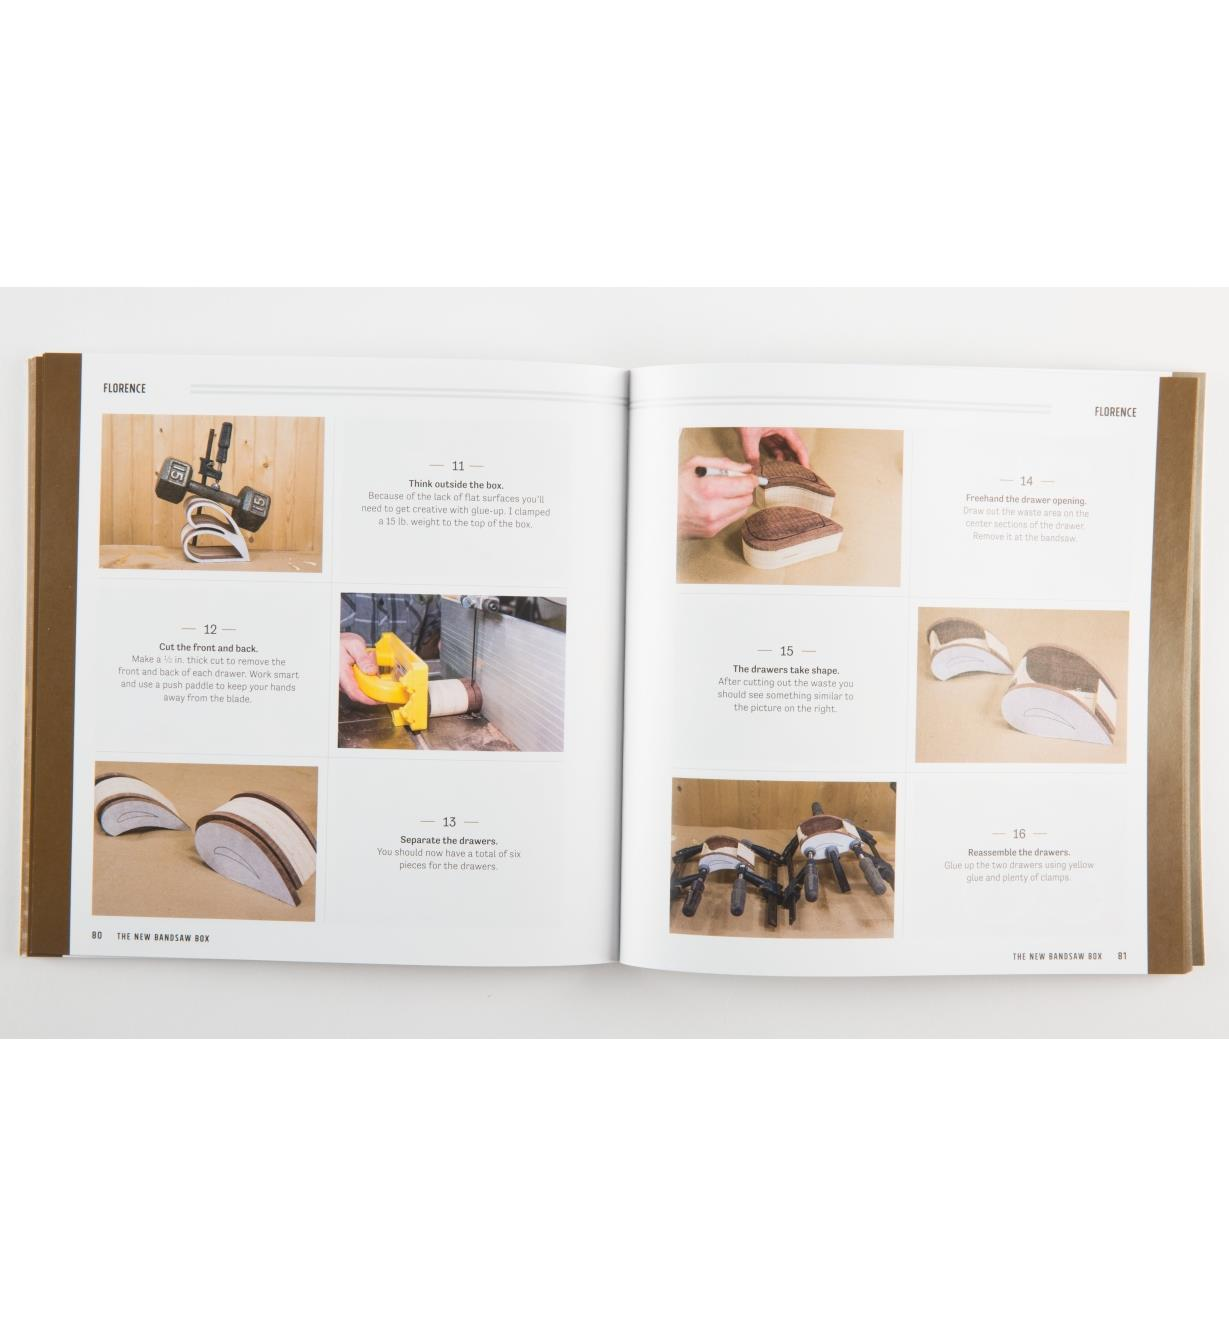 49L2737 - The New Bandsaw Box Book